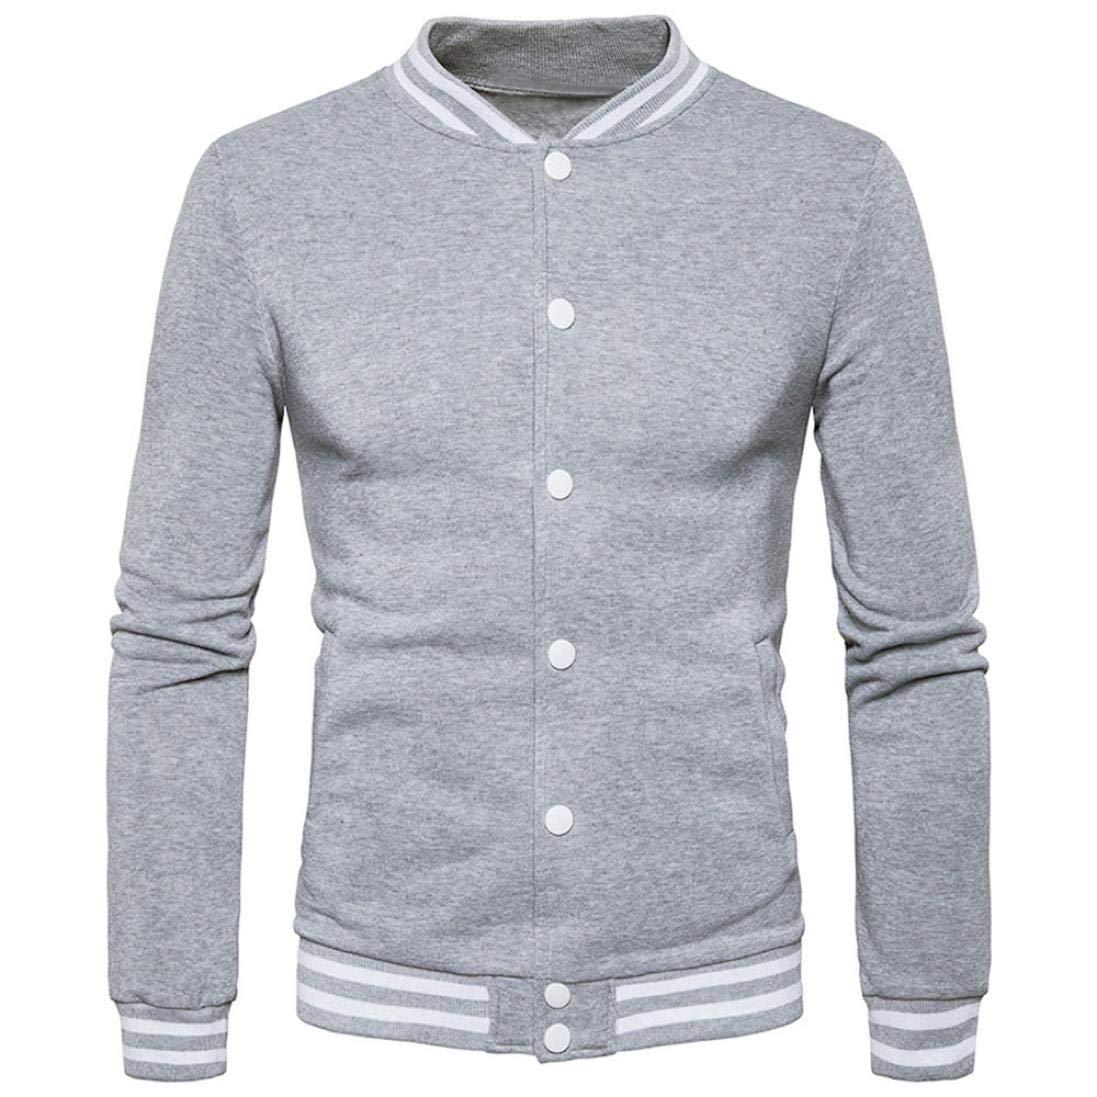 Sharemen Camouflage Zipper Hoodie Men Hooded Sweatshirt Jacket Coat Outerwear